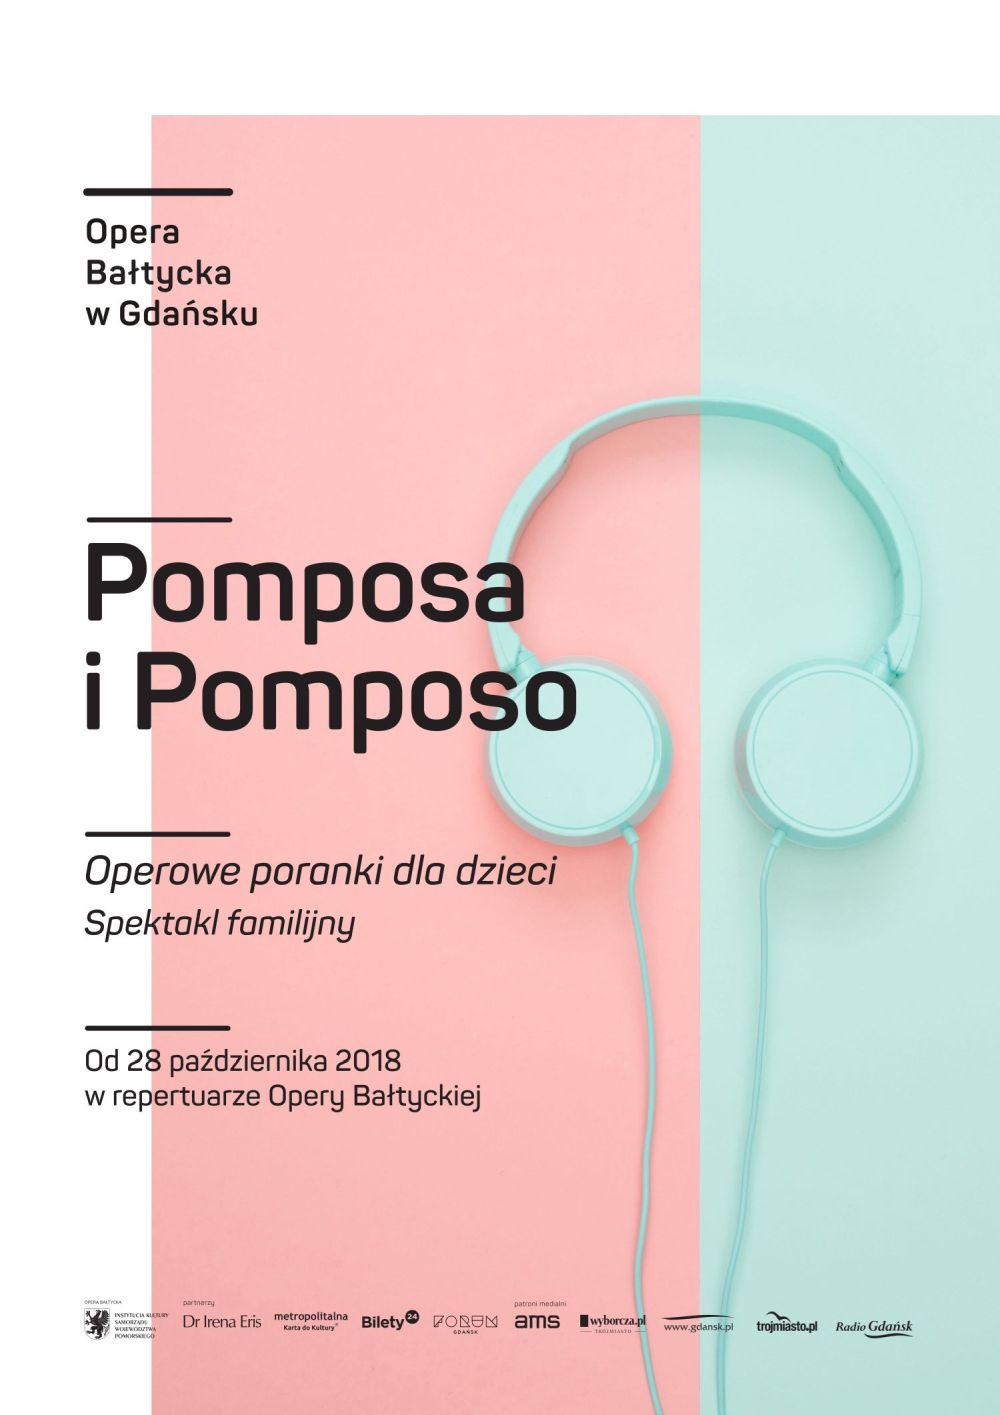 Pomposa i Pomposo - spektakl familijny